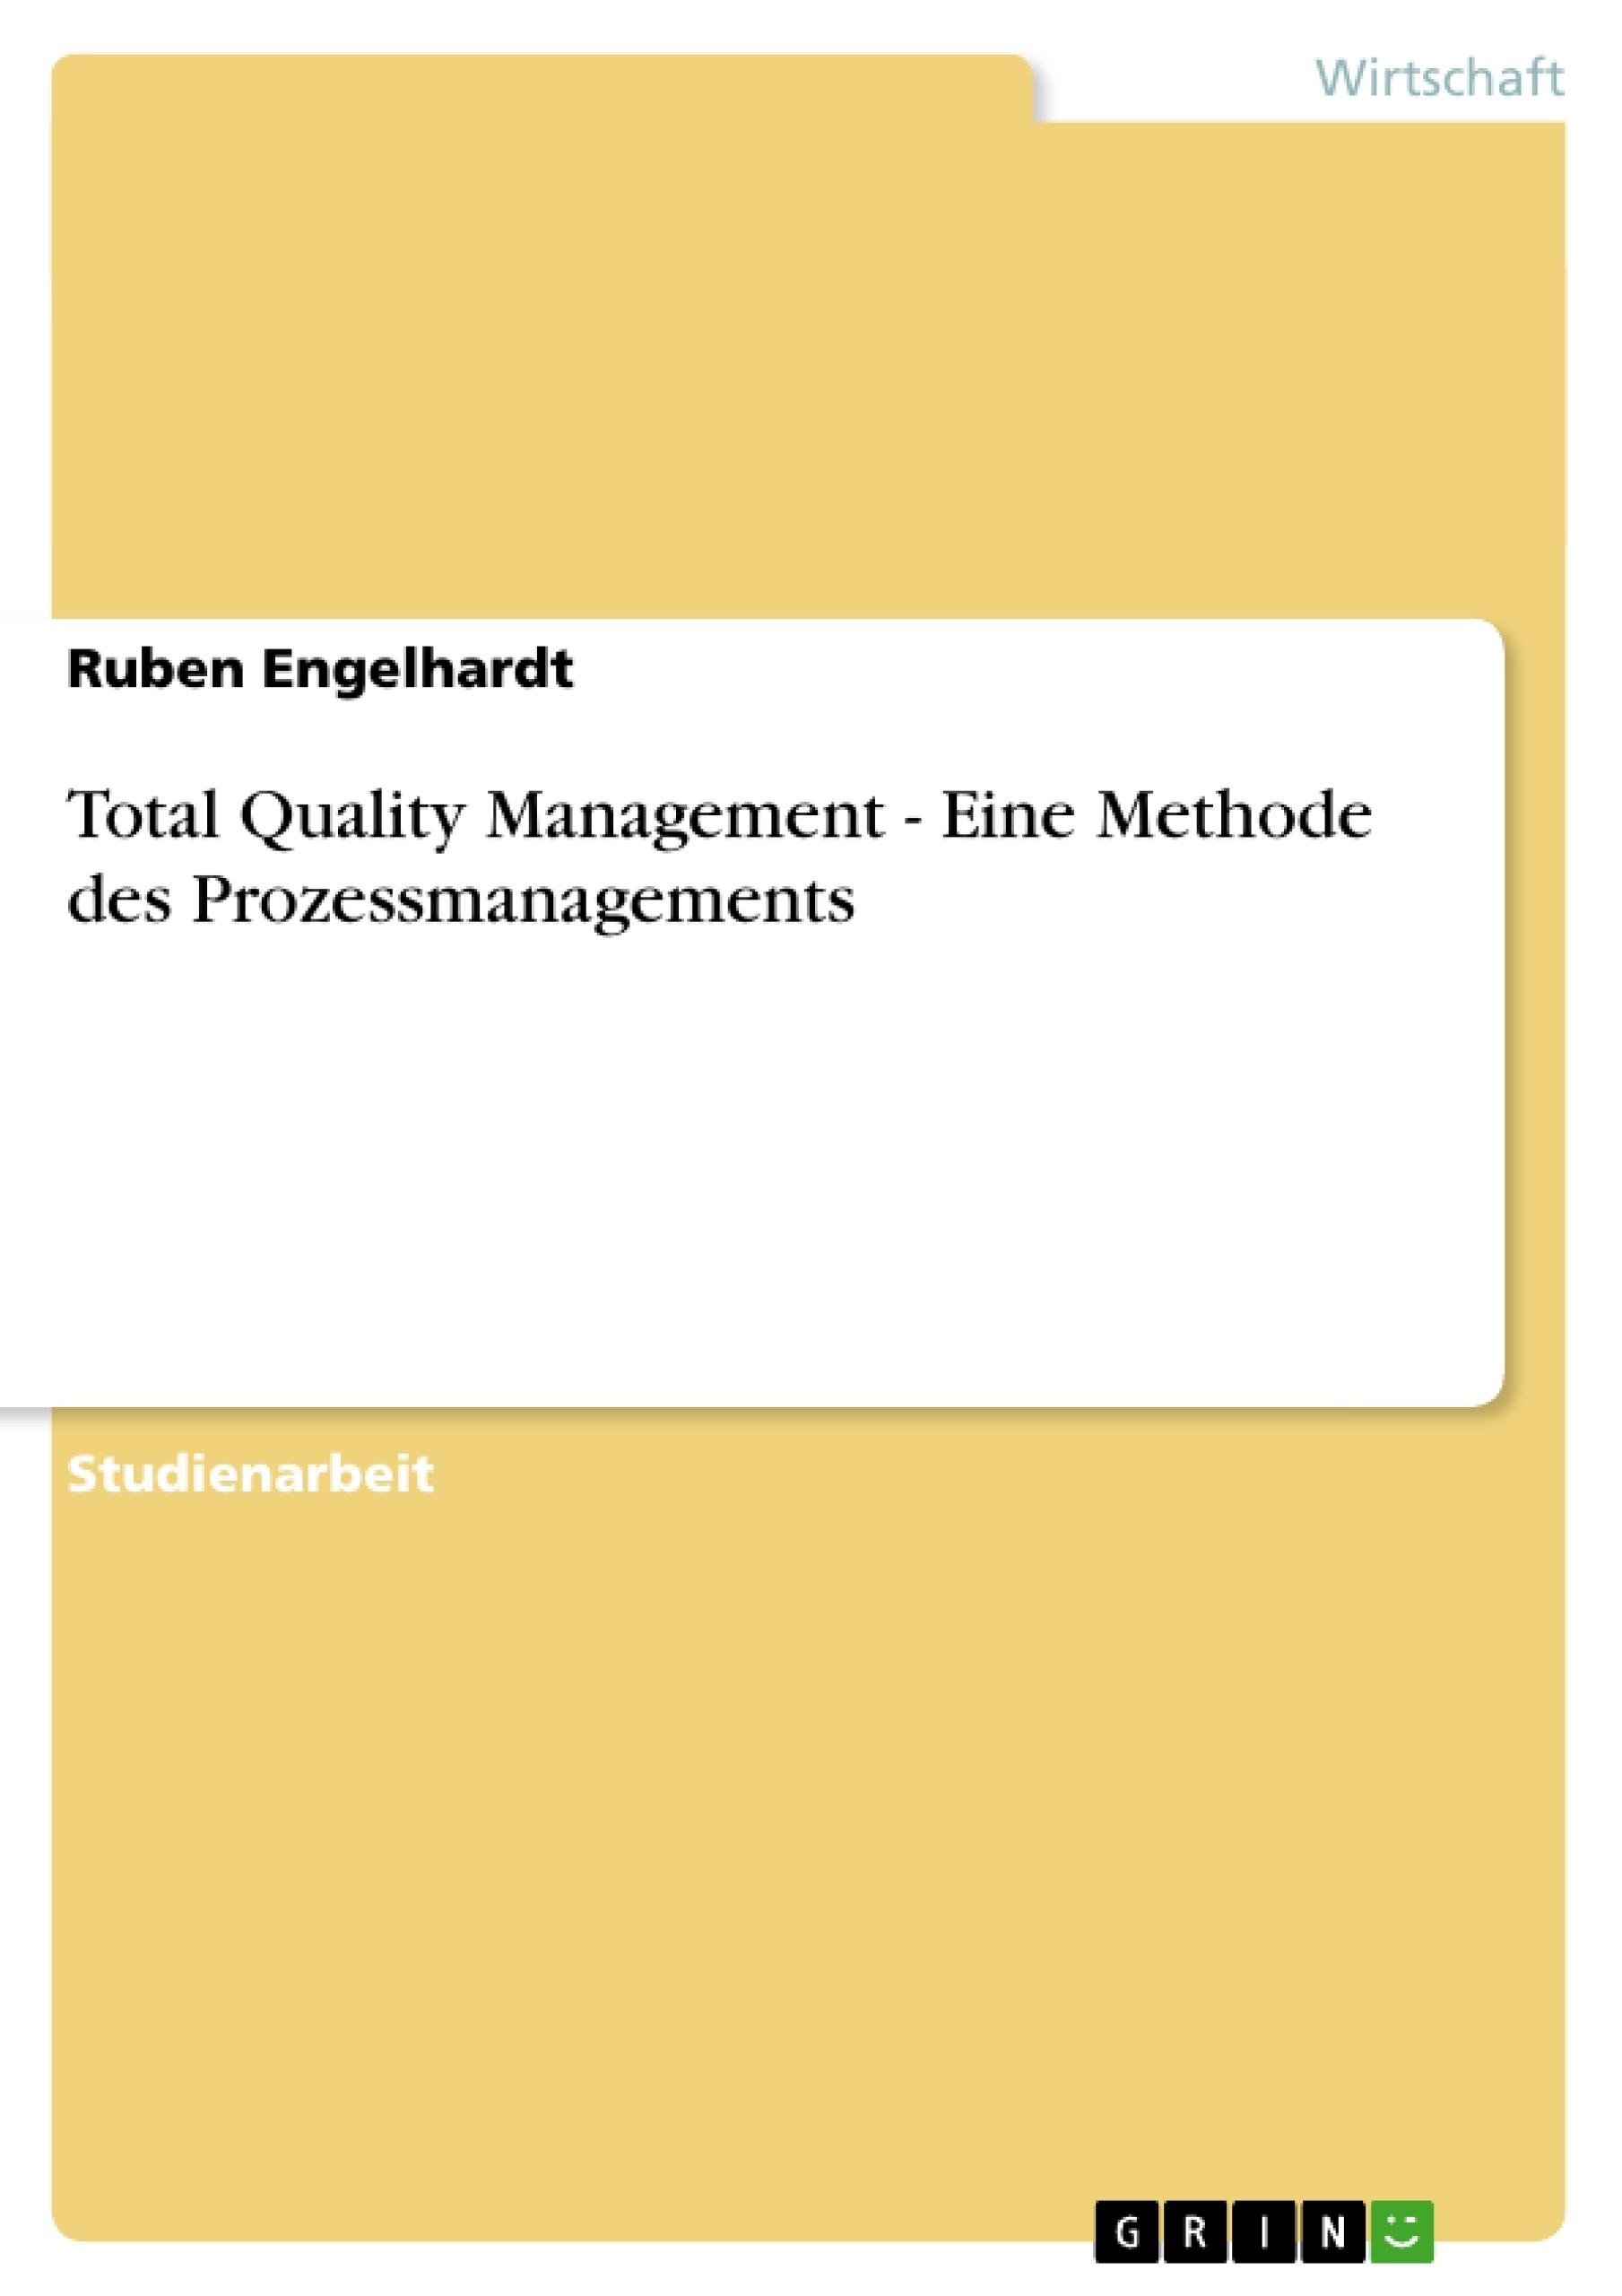 Titel: Total Quality Management - Eine Methode des Prozessmanagements